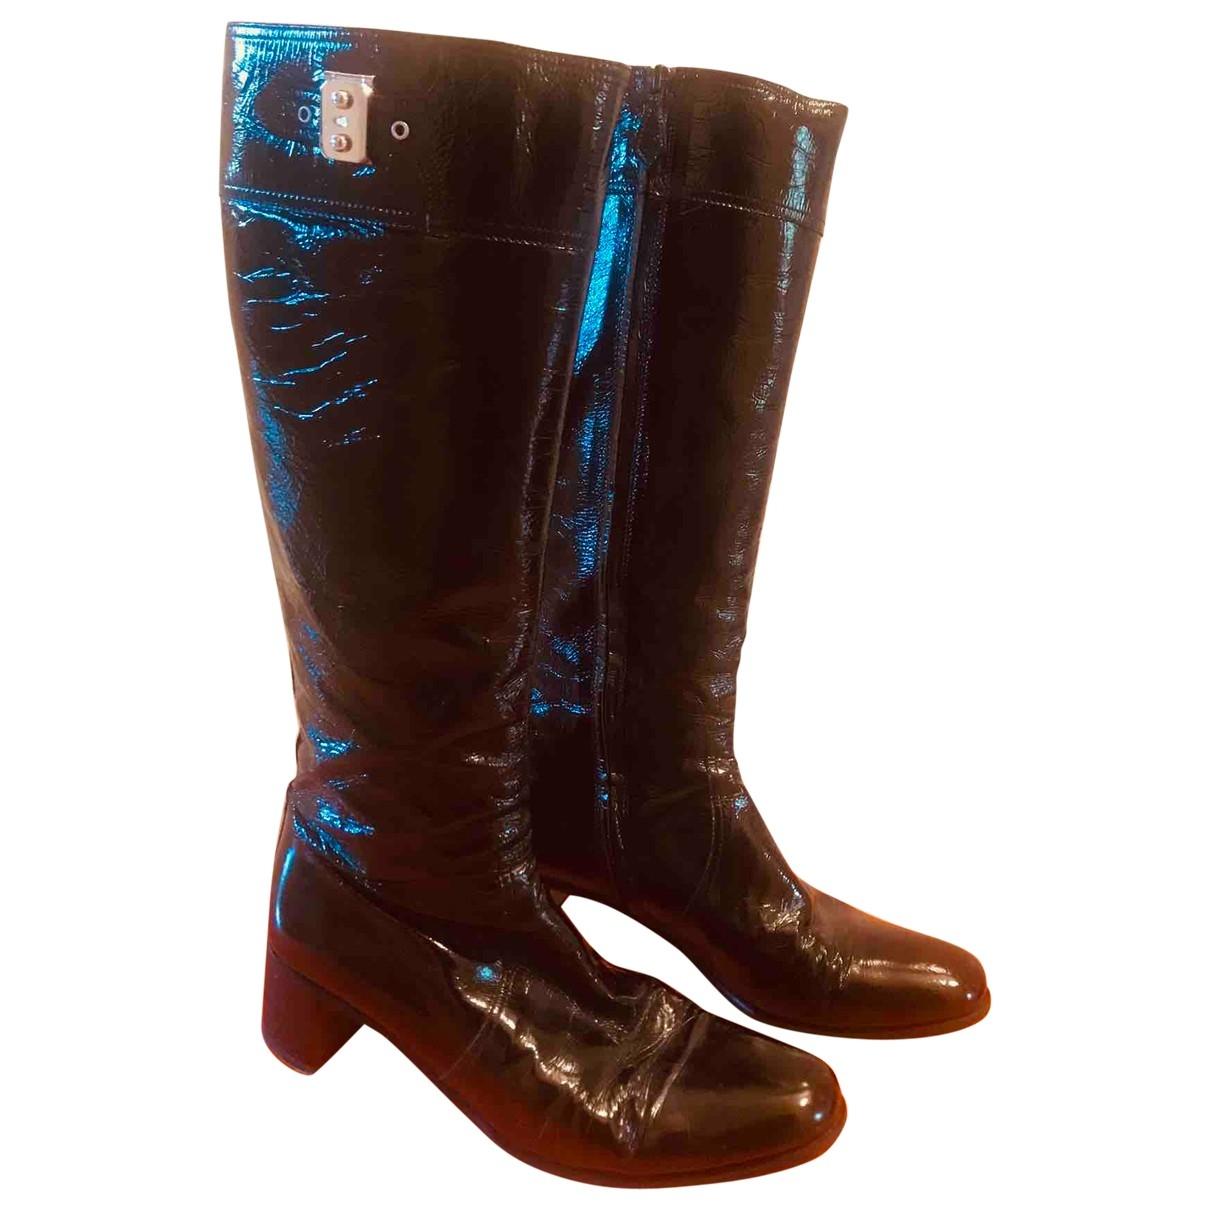 Hermes \N Stiefel in  Schwarz Lackleder